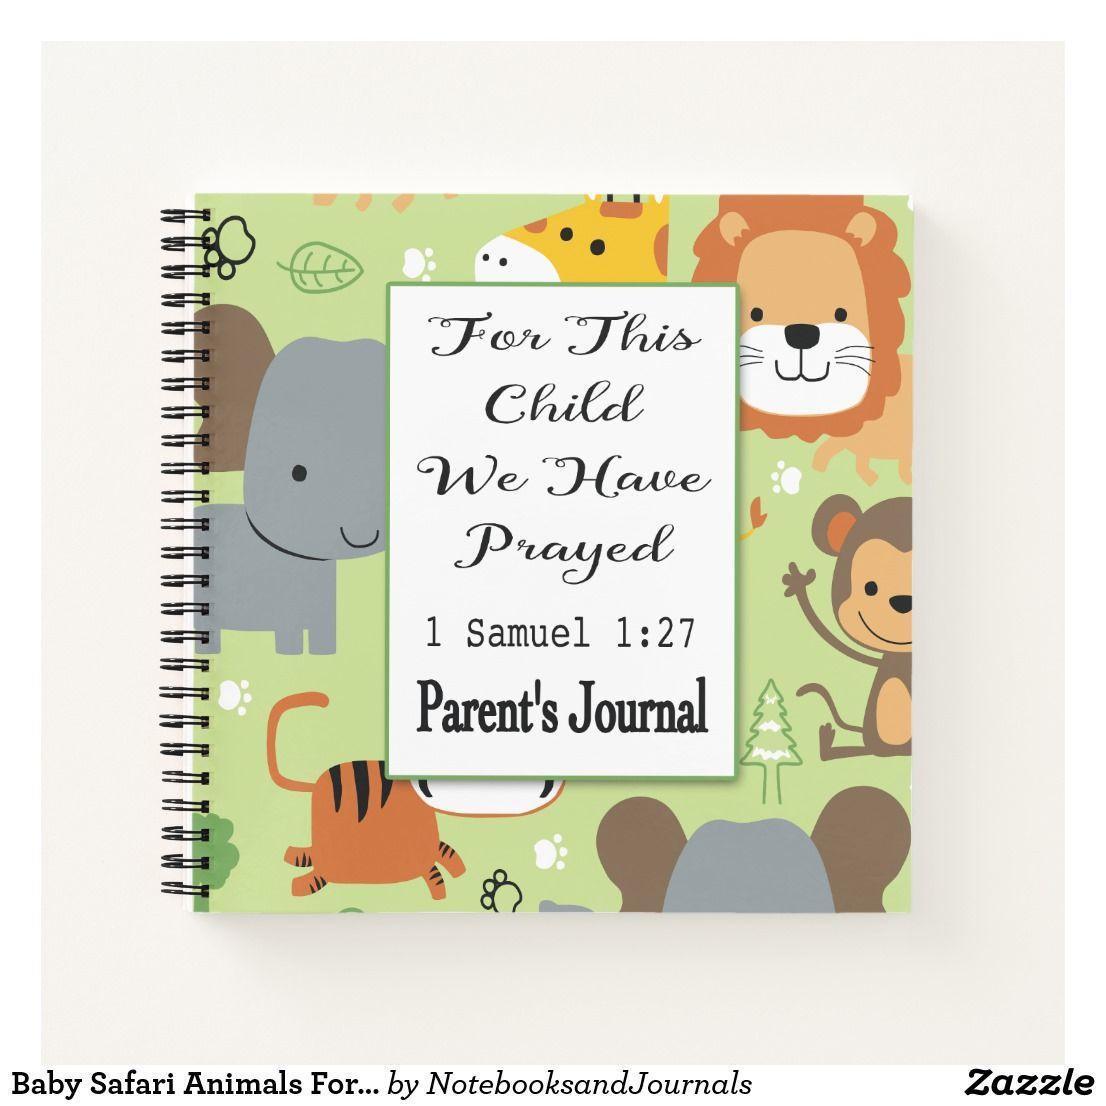 Baby Safari Animals For This Child We Have Prayed Notebook